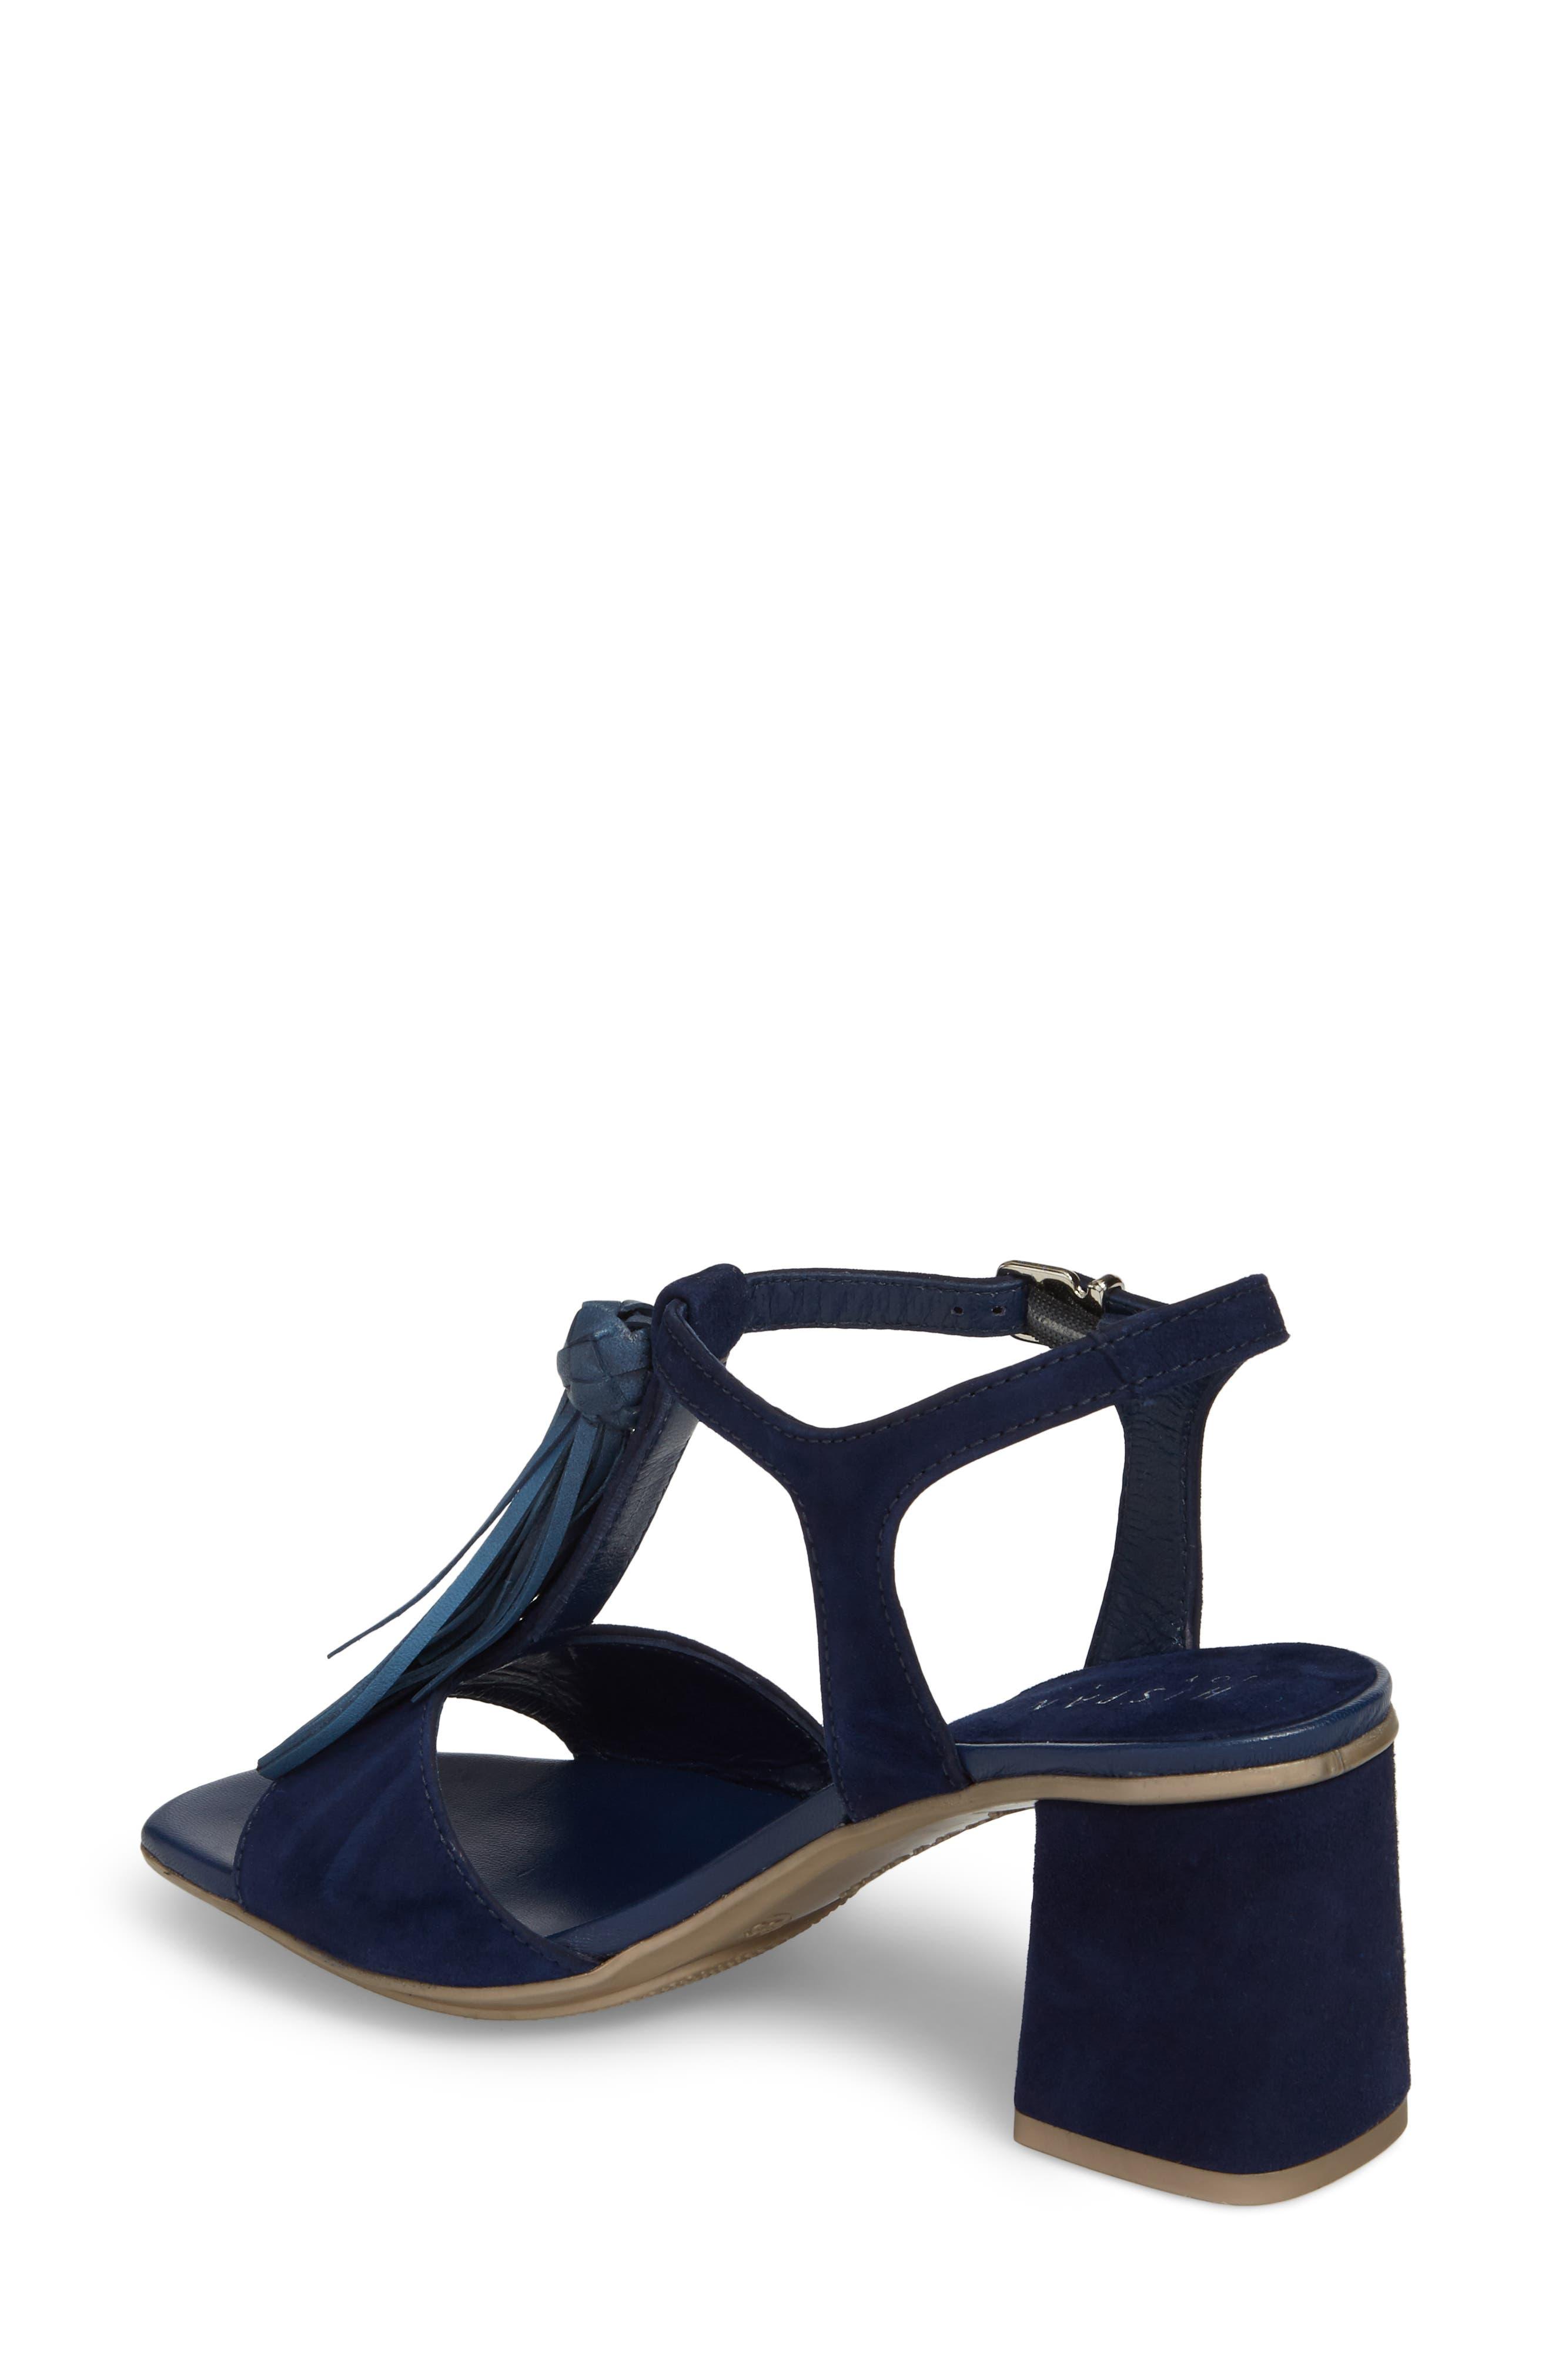 Schulyer T-Strap Sandal,                             Alternate thumbnail 2, color,                             400